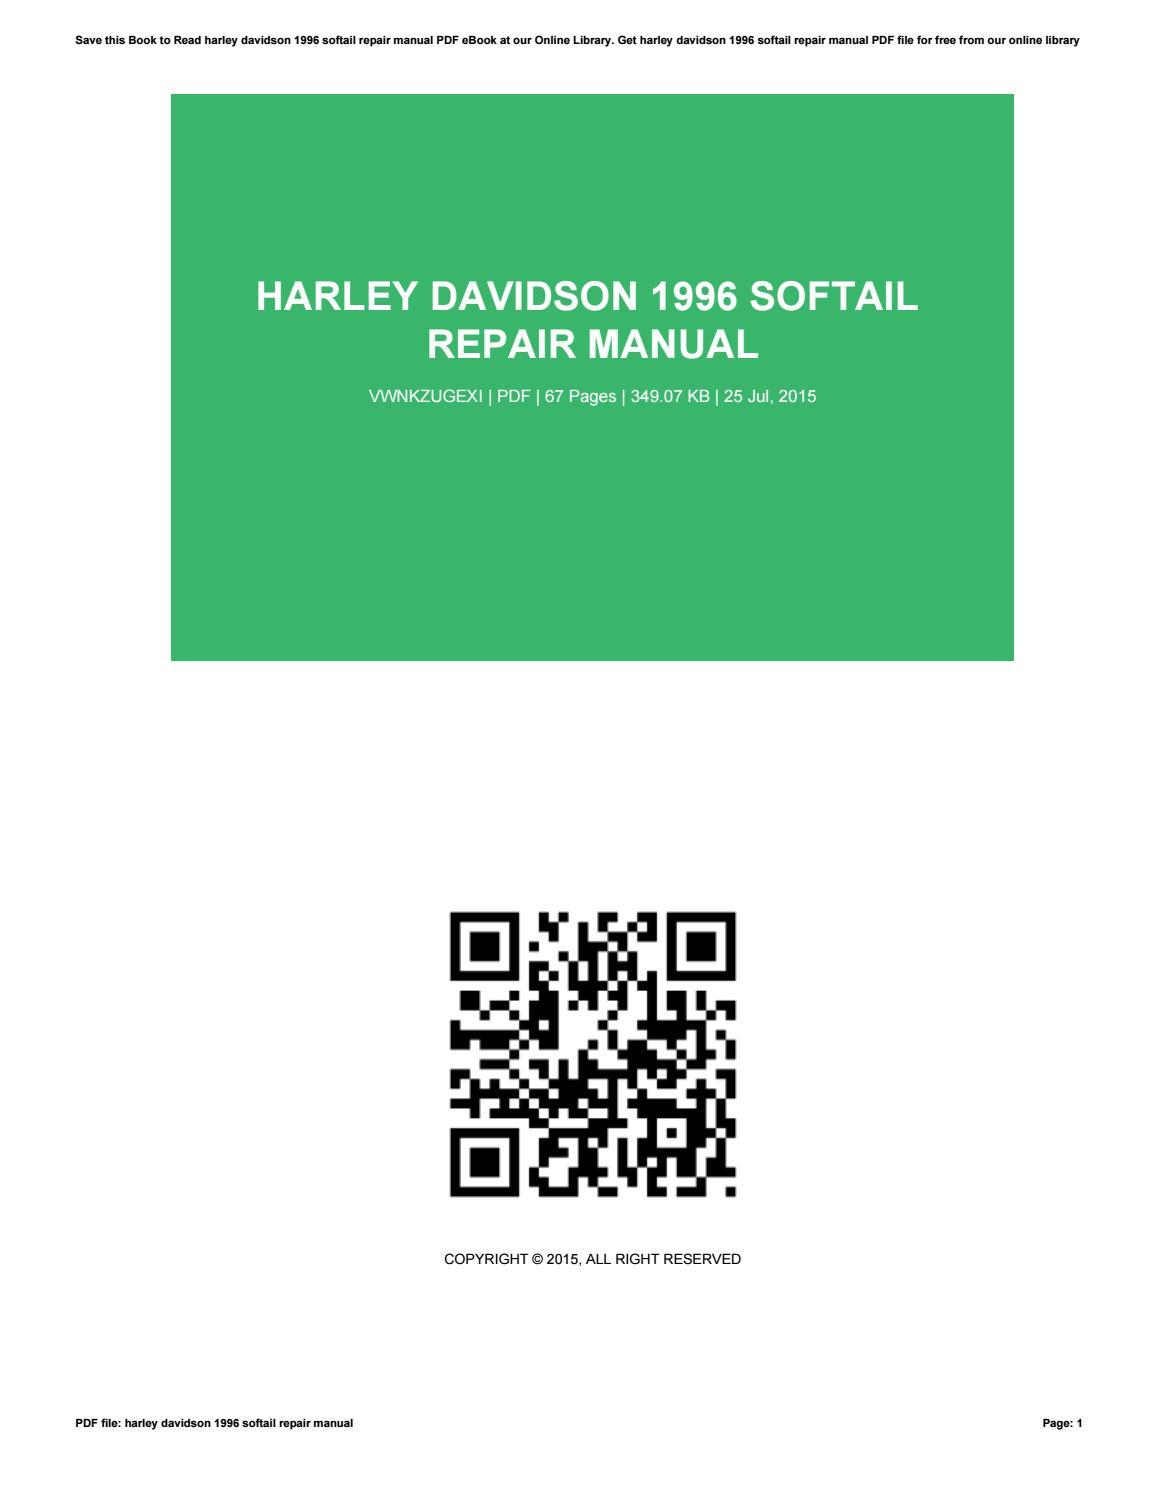 2015 harley softail manual ebook